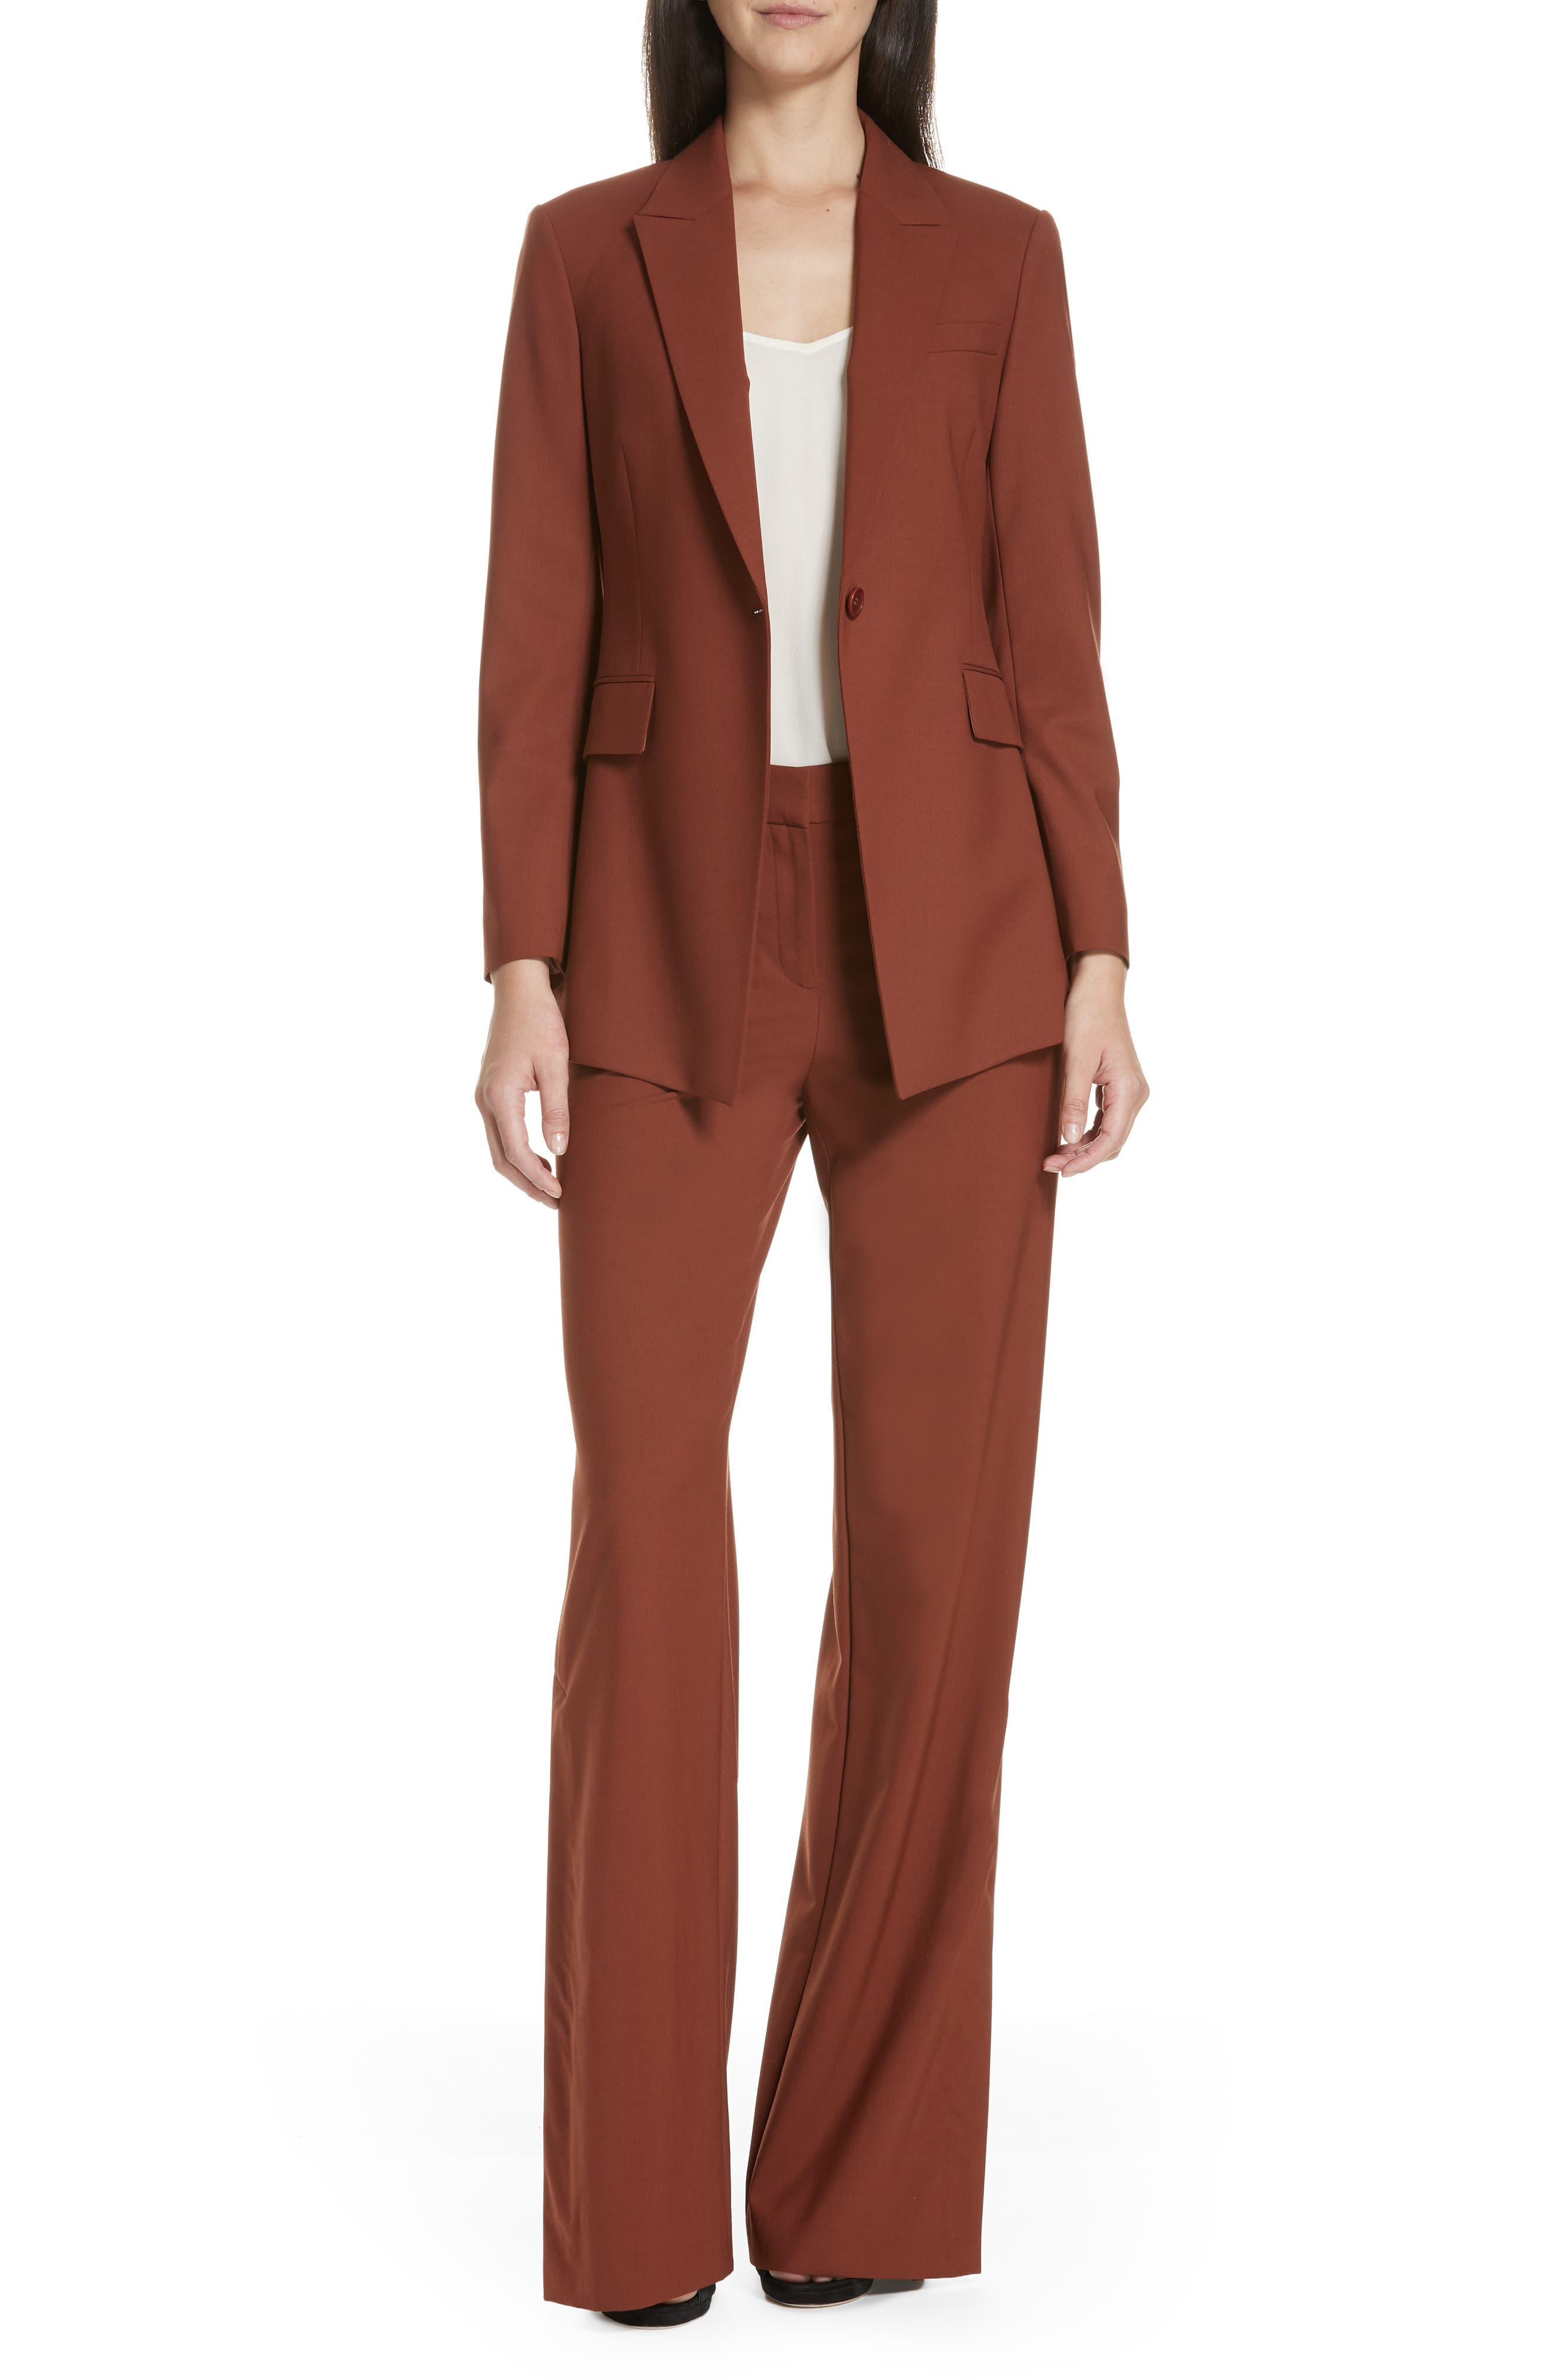 Etienette B Good Wool Suit Jacket,                             Alternate thumbnail 51, color,